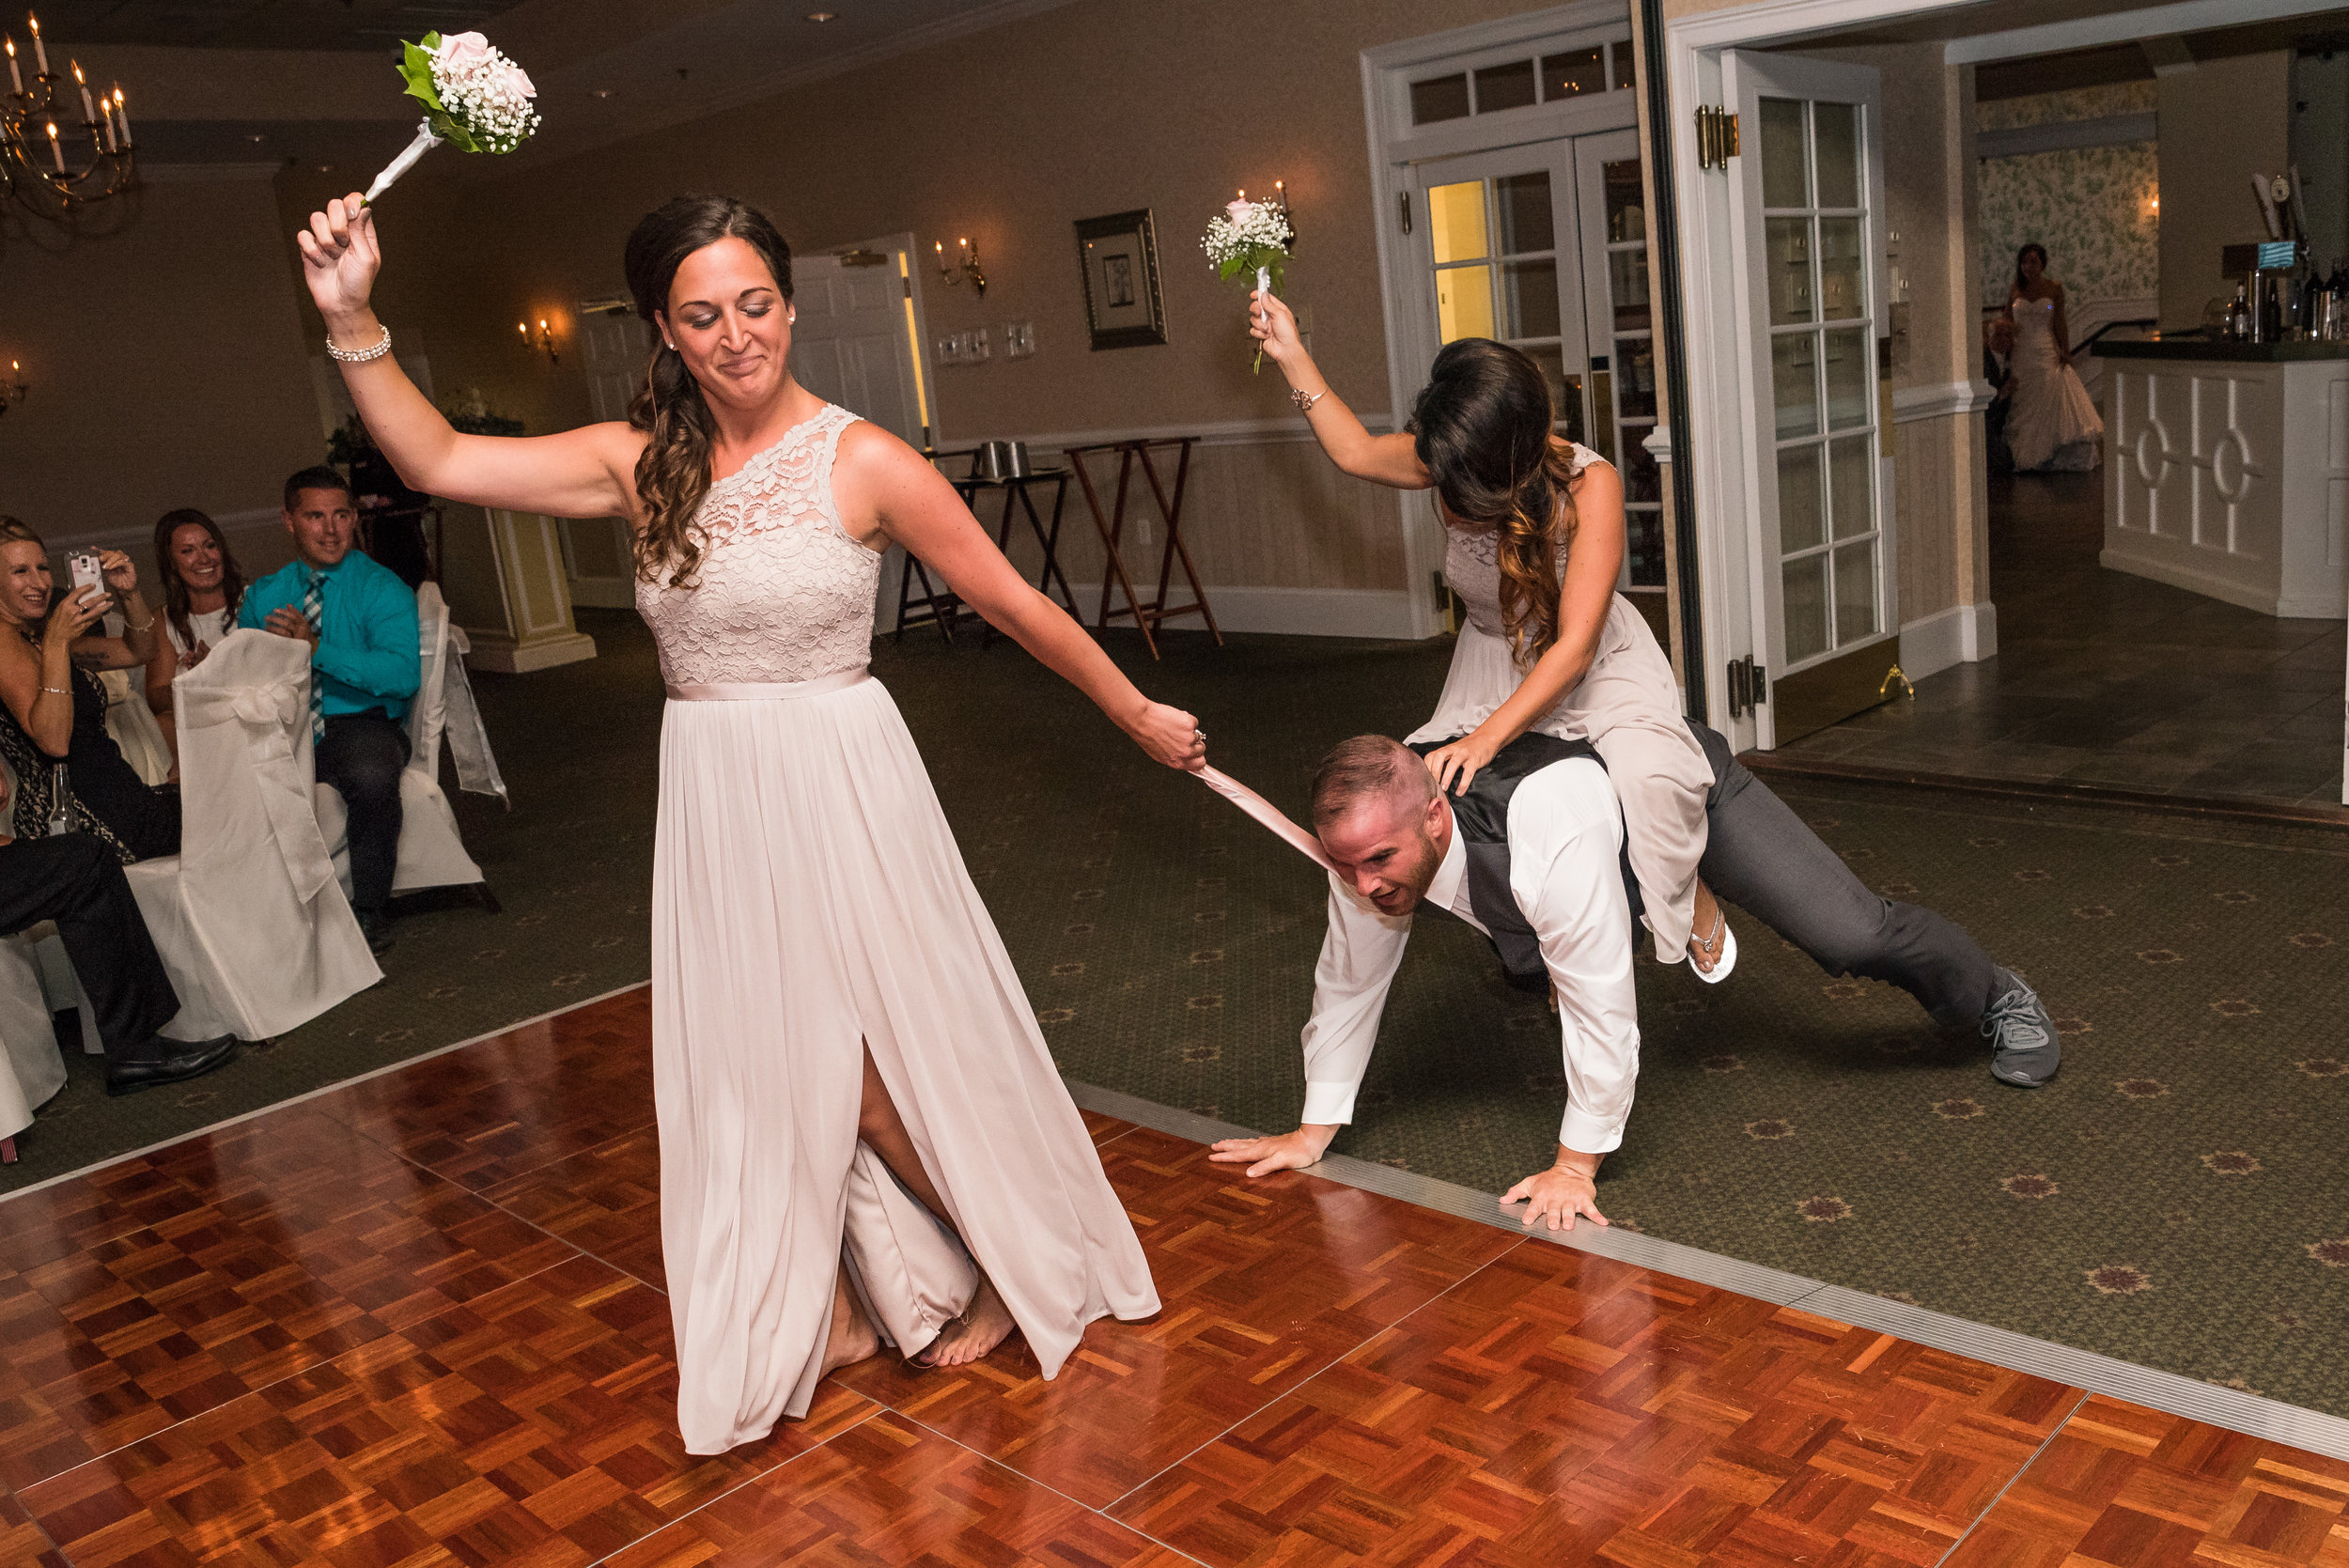 Seaoaks Wedding Photos Steph 32